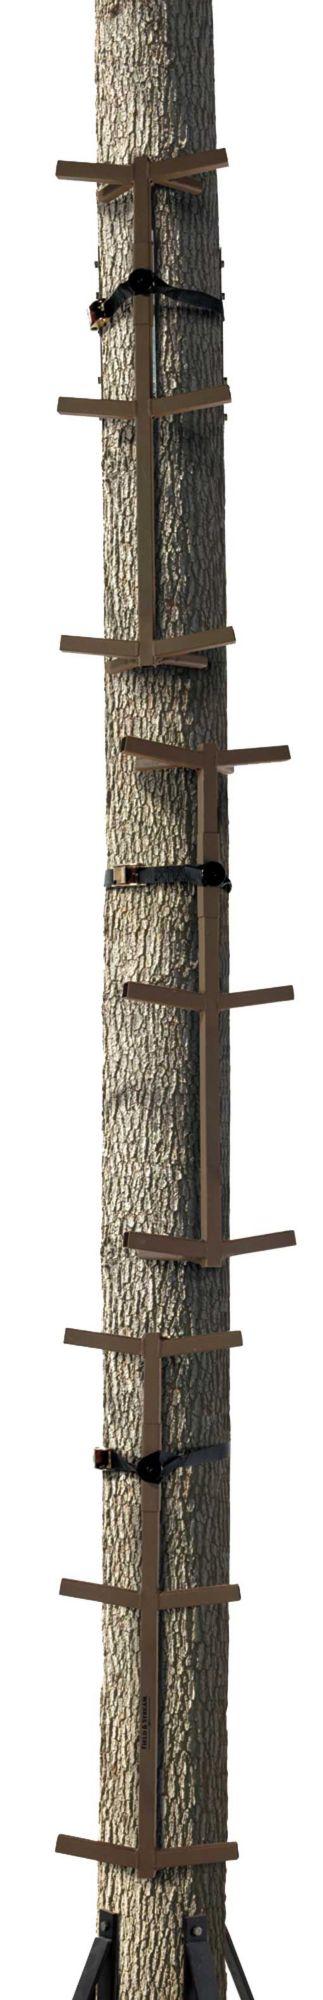 "Field & Stream 32"" Climbing Sticks - 4 Pack thumbnail"